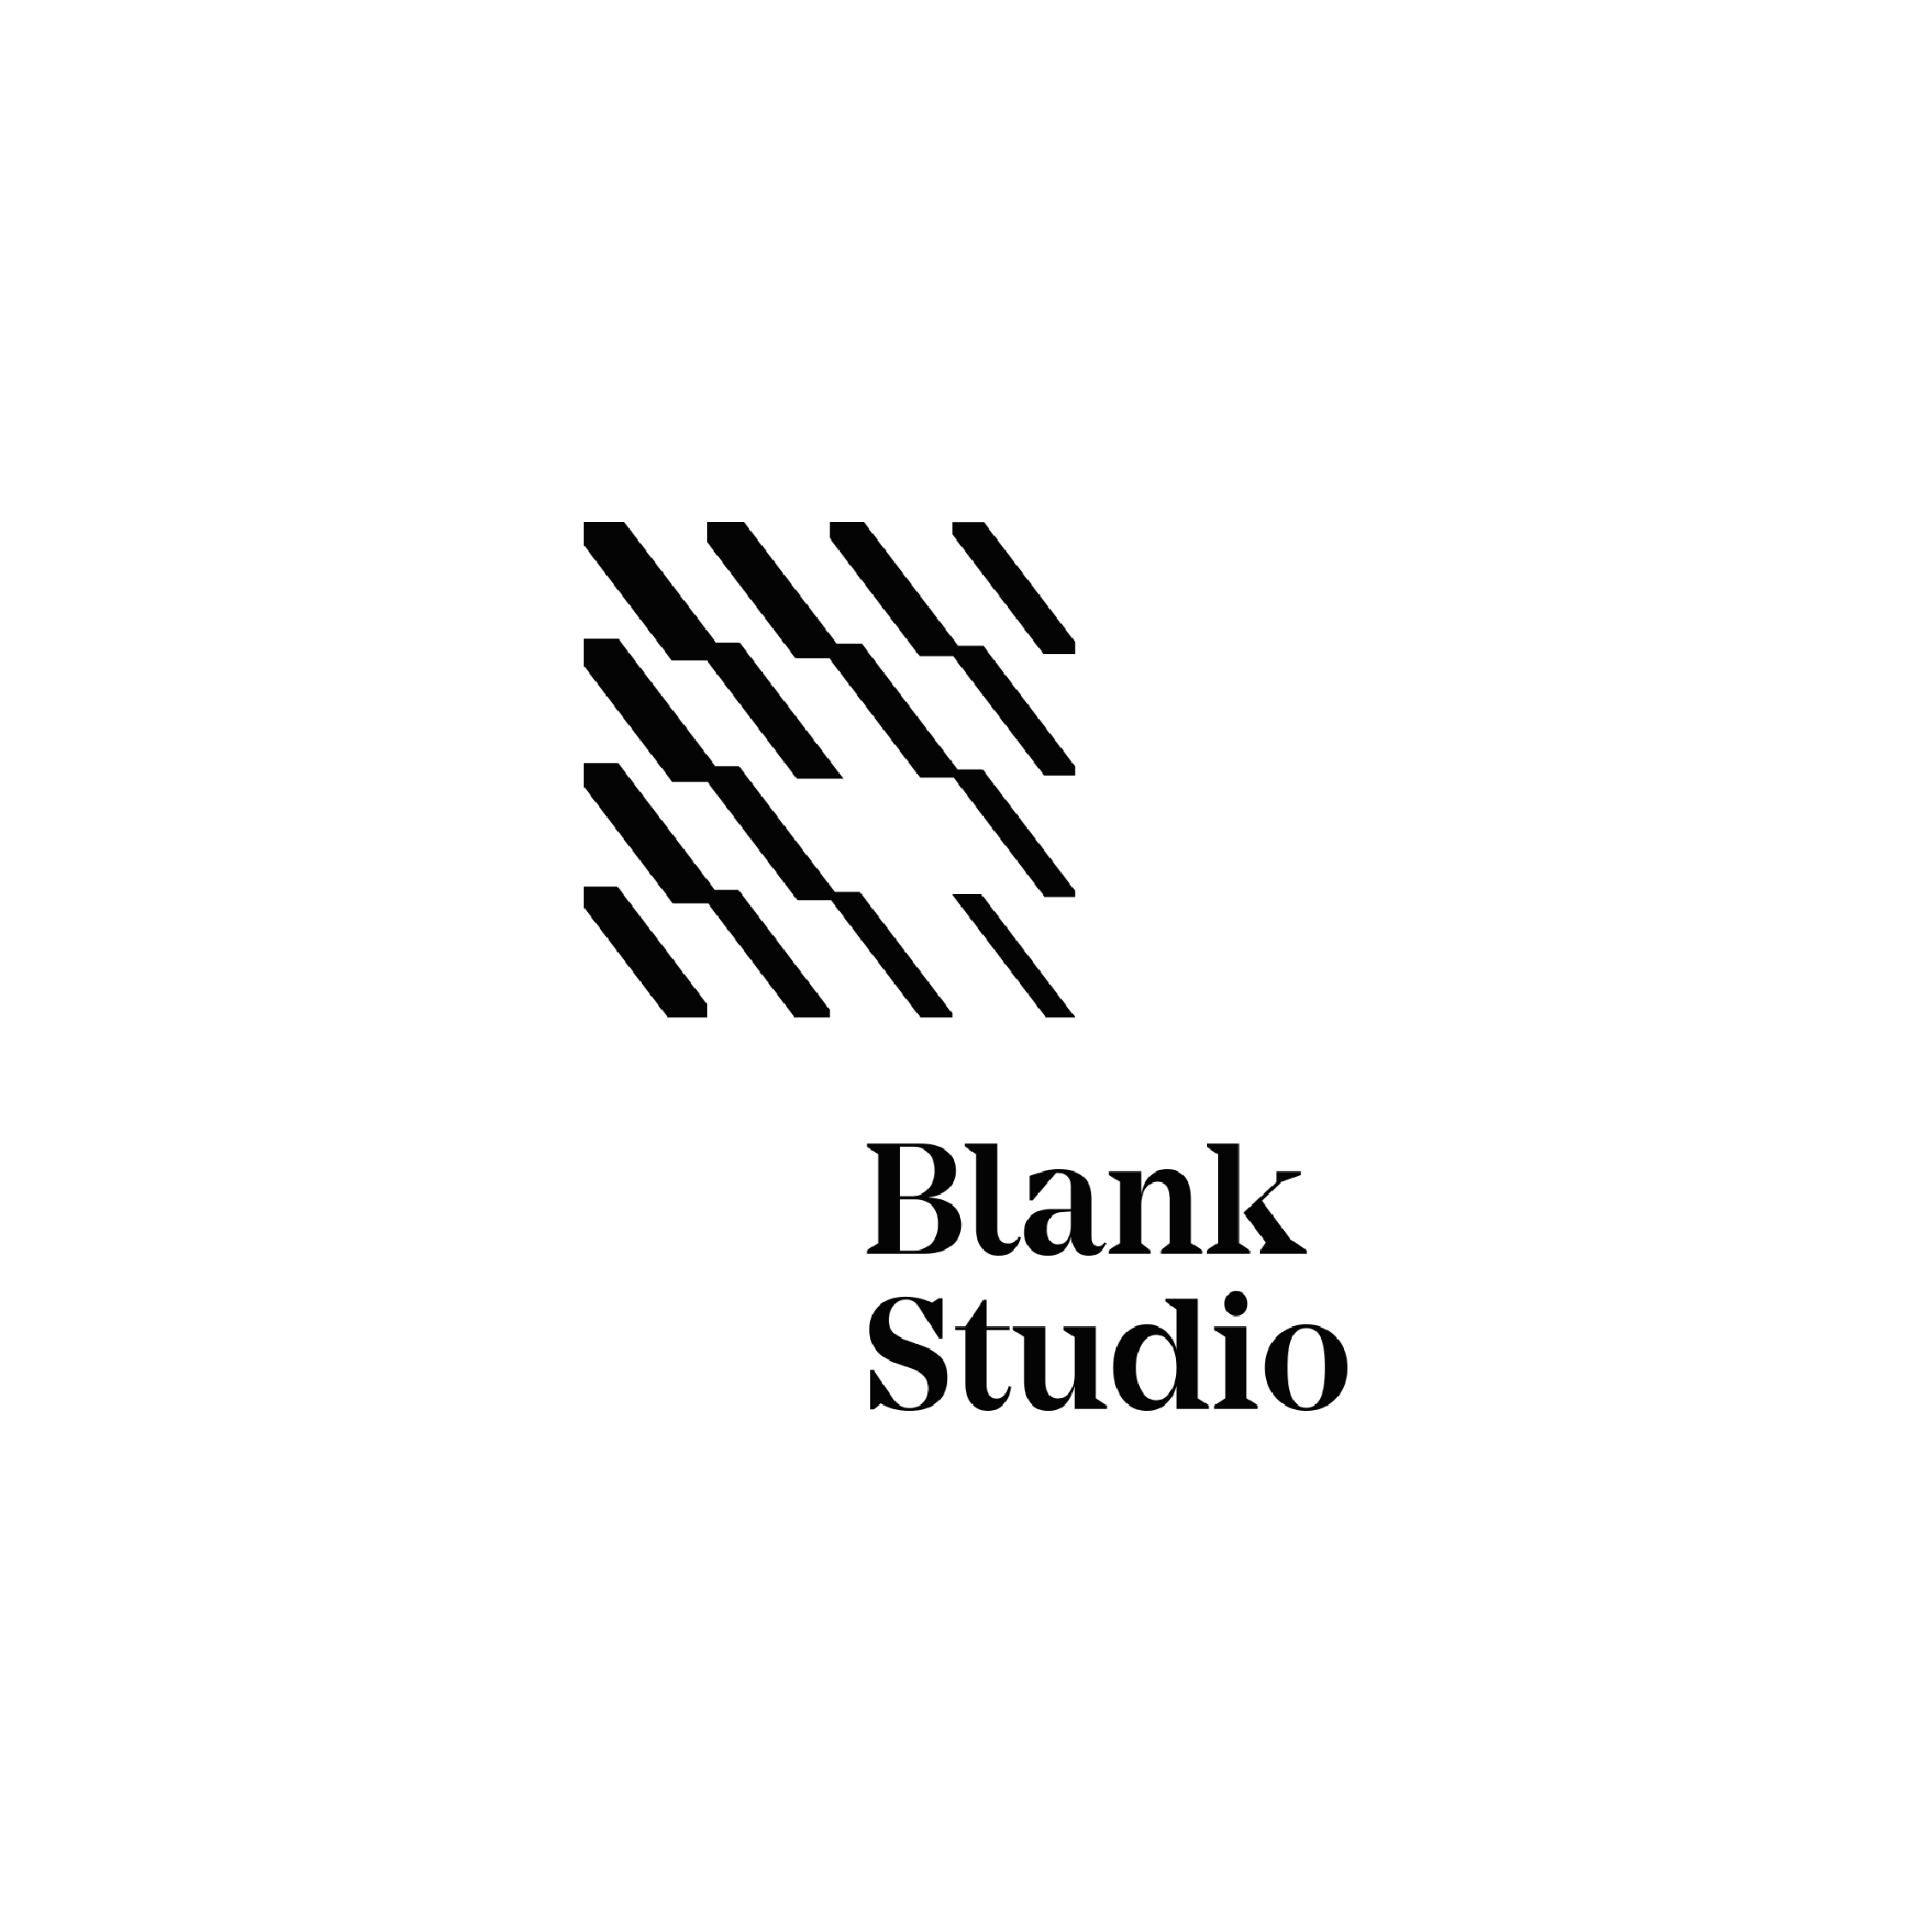 Blank Studio